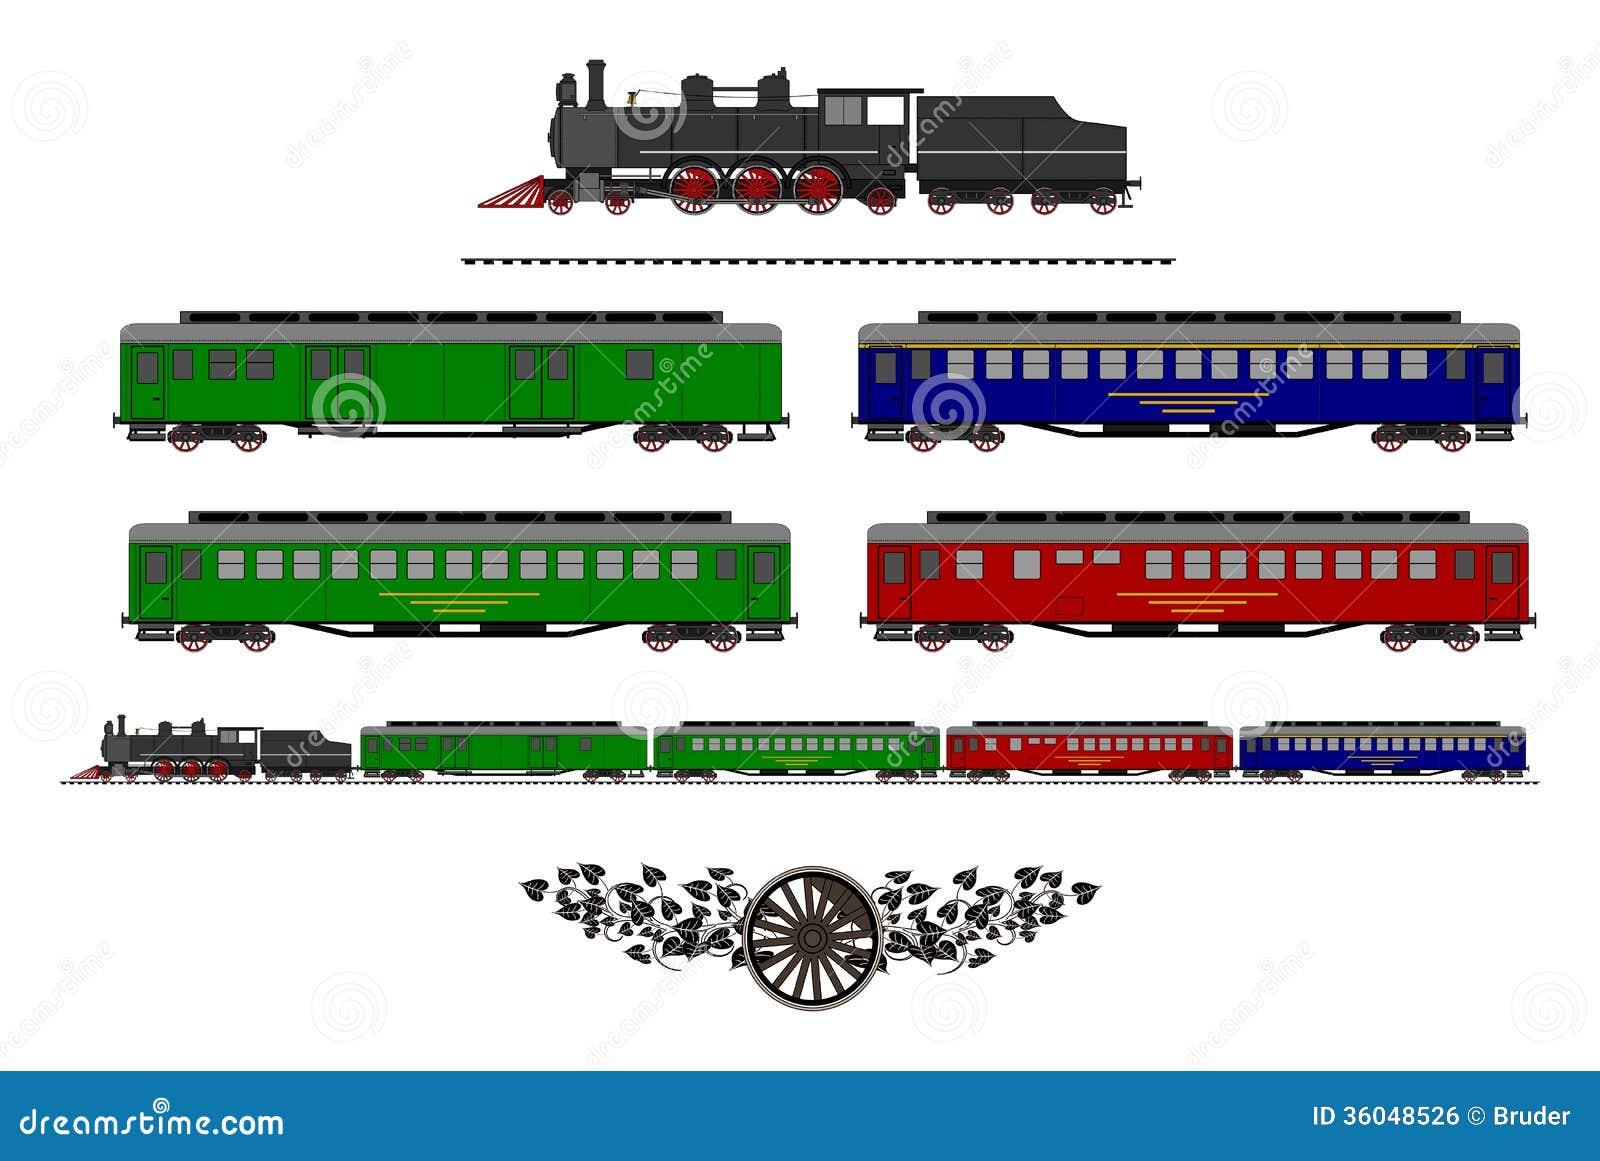 Vintage Train Kit Royalty Free Stock Image - Image: 36048526